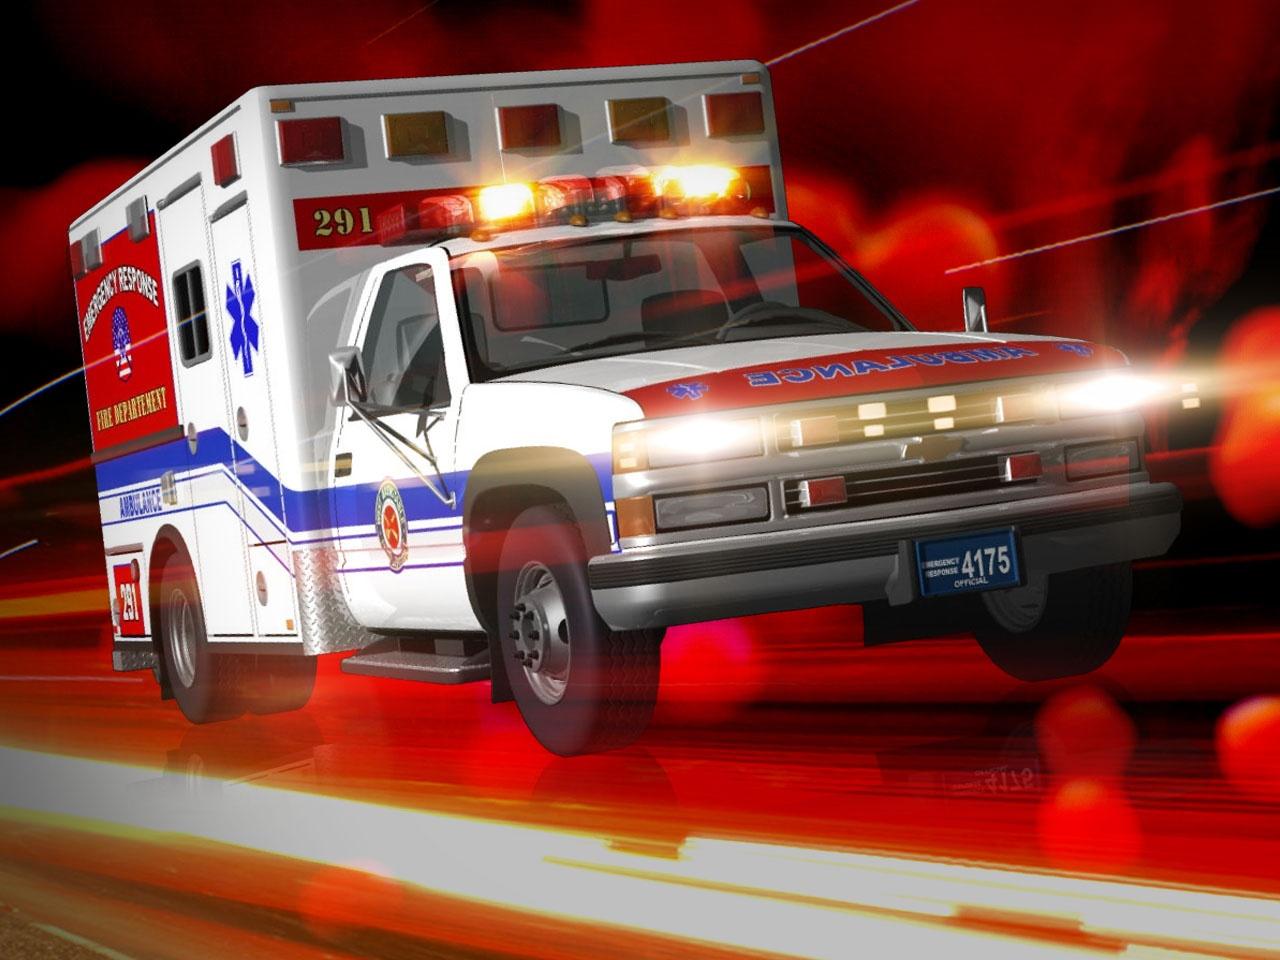 Ambulance blur_1512259429433.jpg